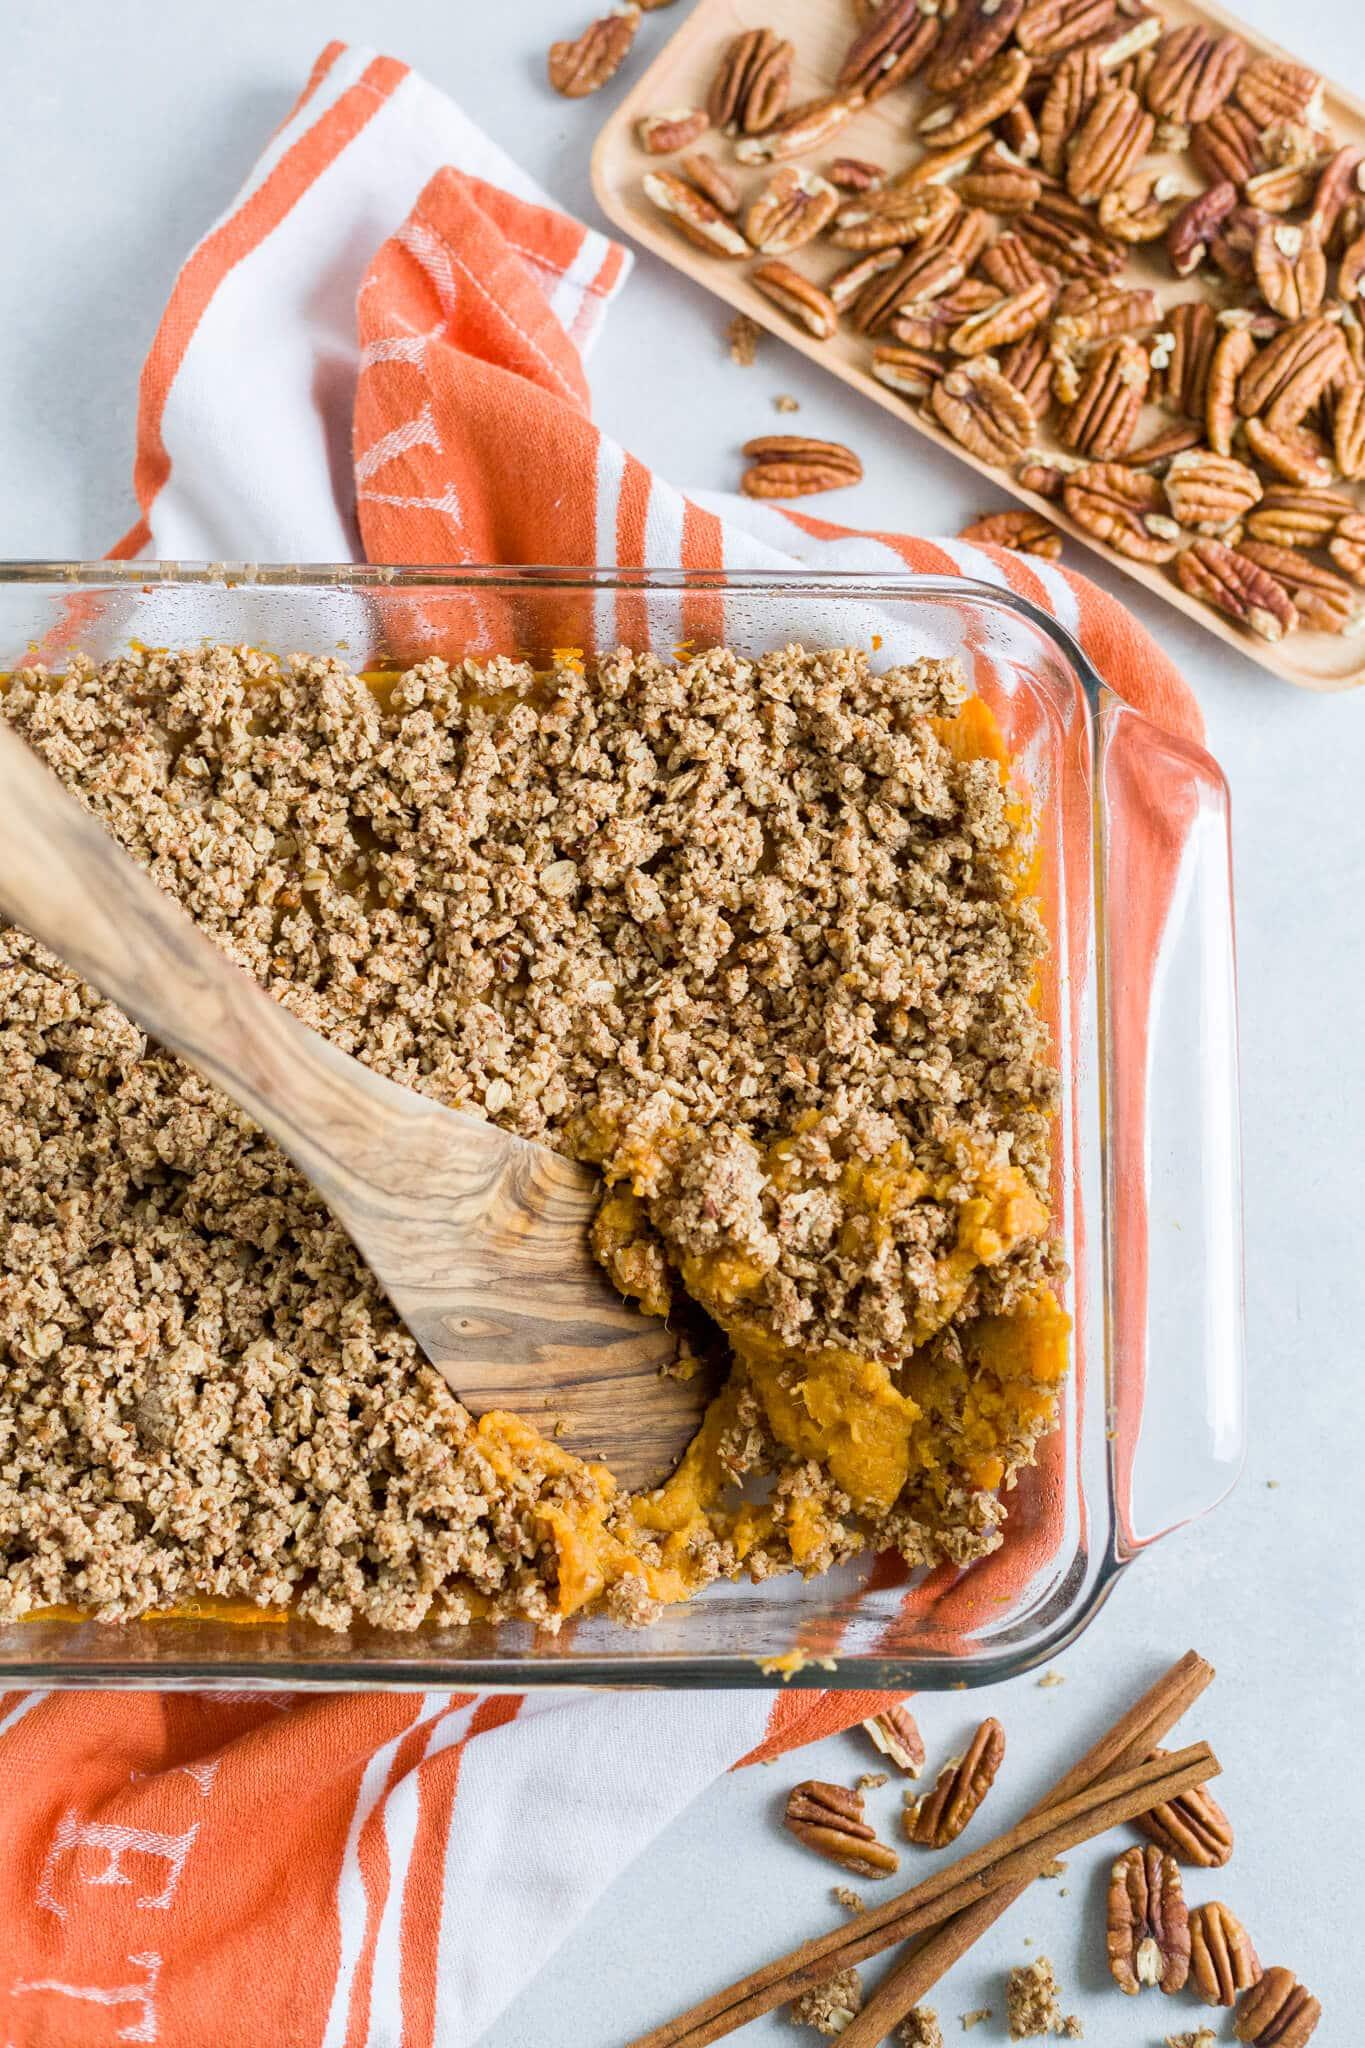 healthy sweet potato casserole with oatmeal